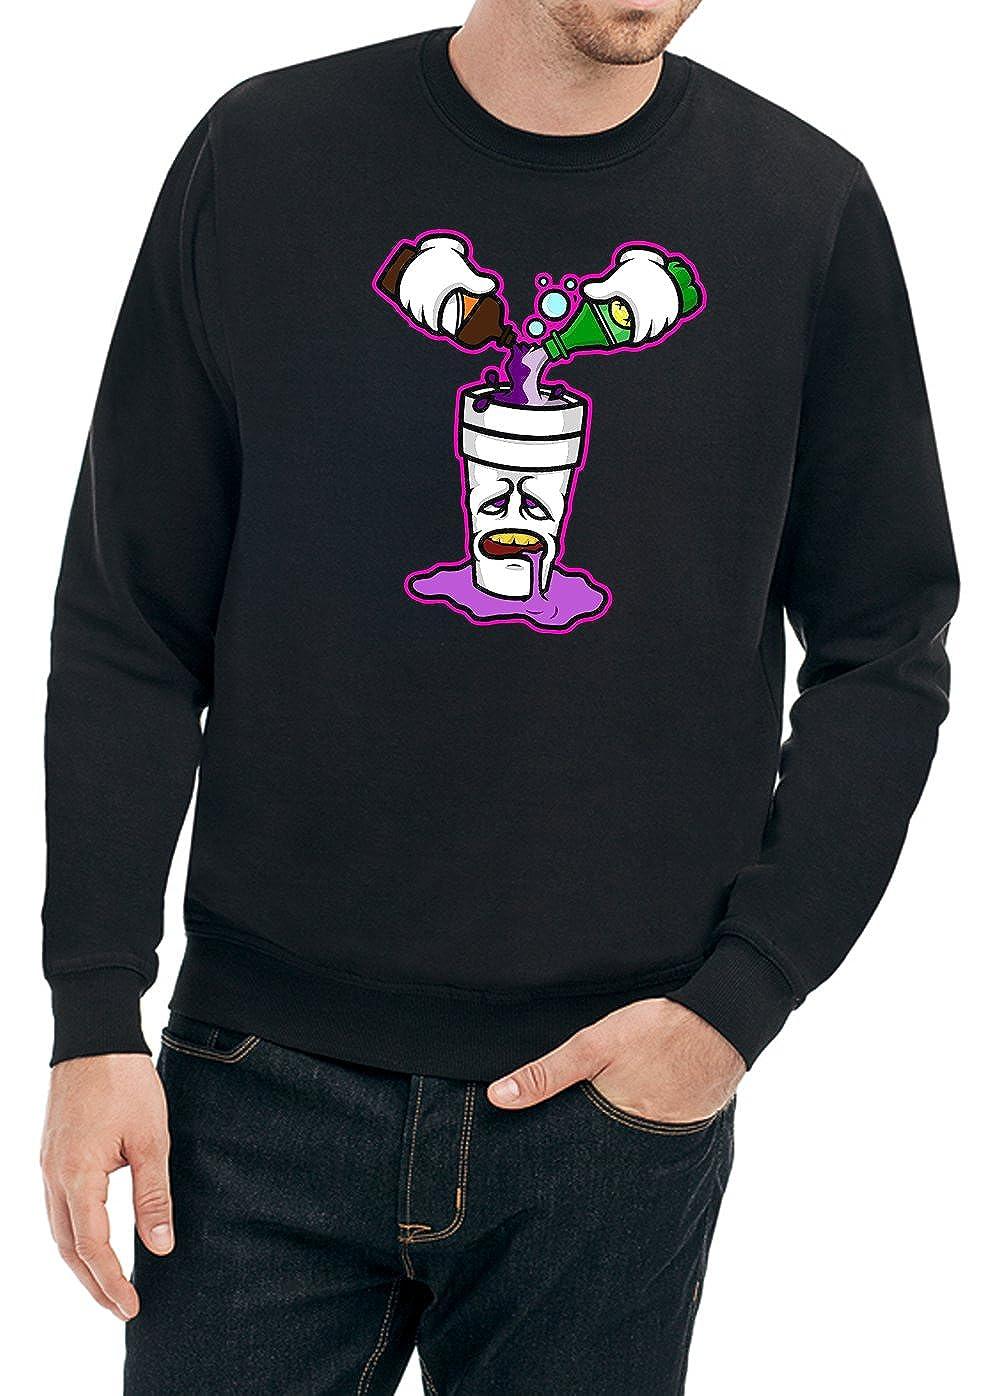 Certified Freak lila Drank Sweater schwarz B07CY581NS Sweatshirts Qualifizierte Herstellung